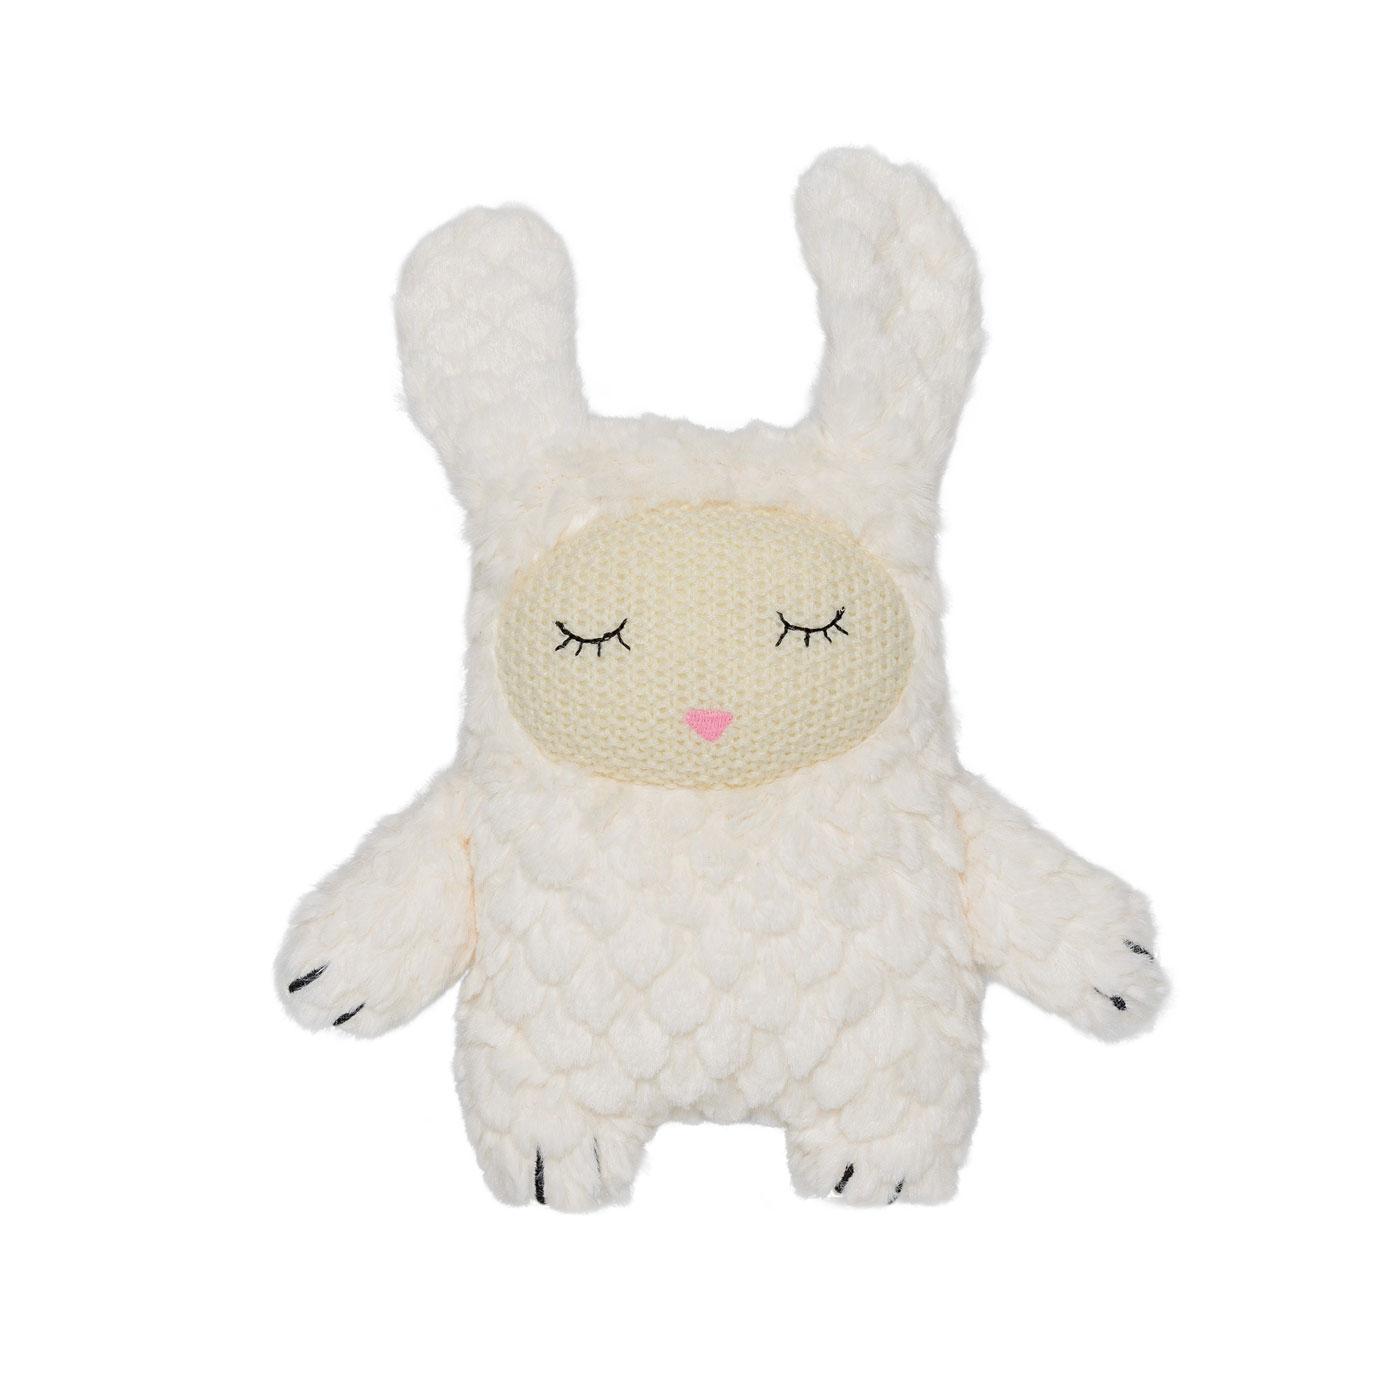 plush bnny rabbit toy bloomingville white color